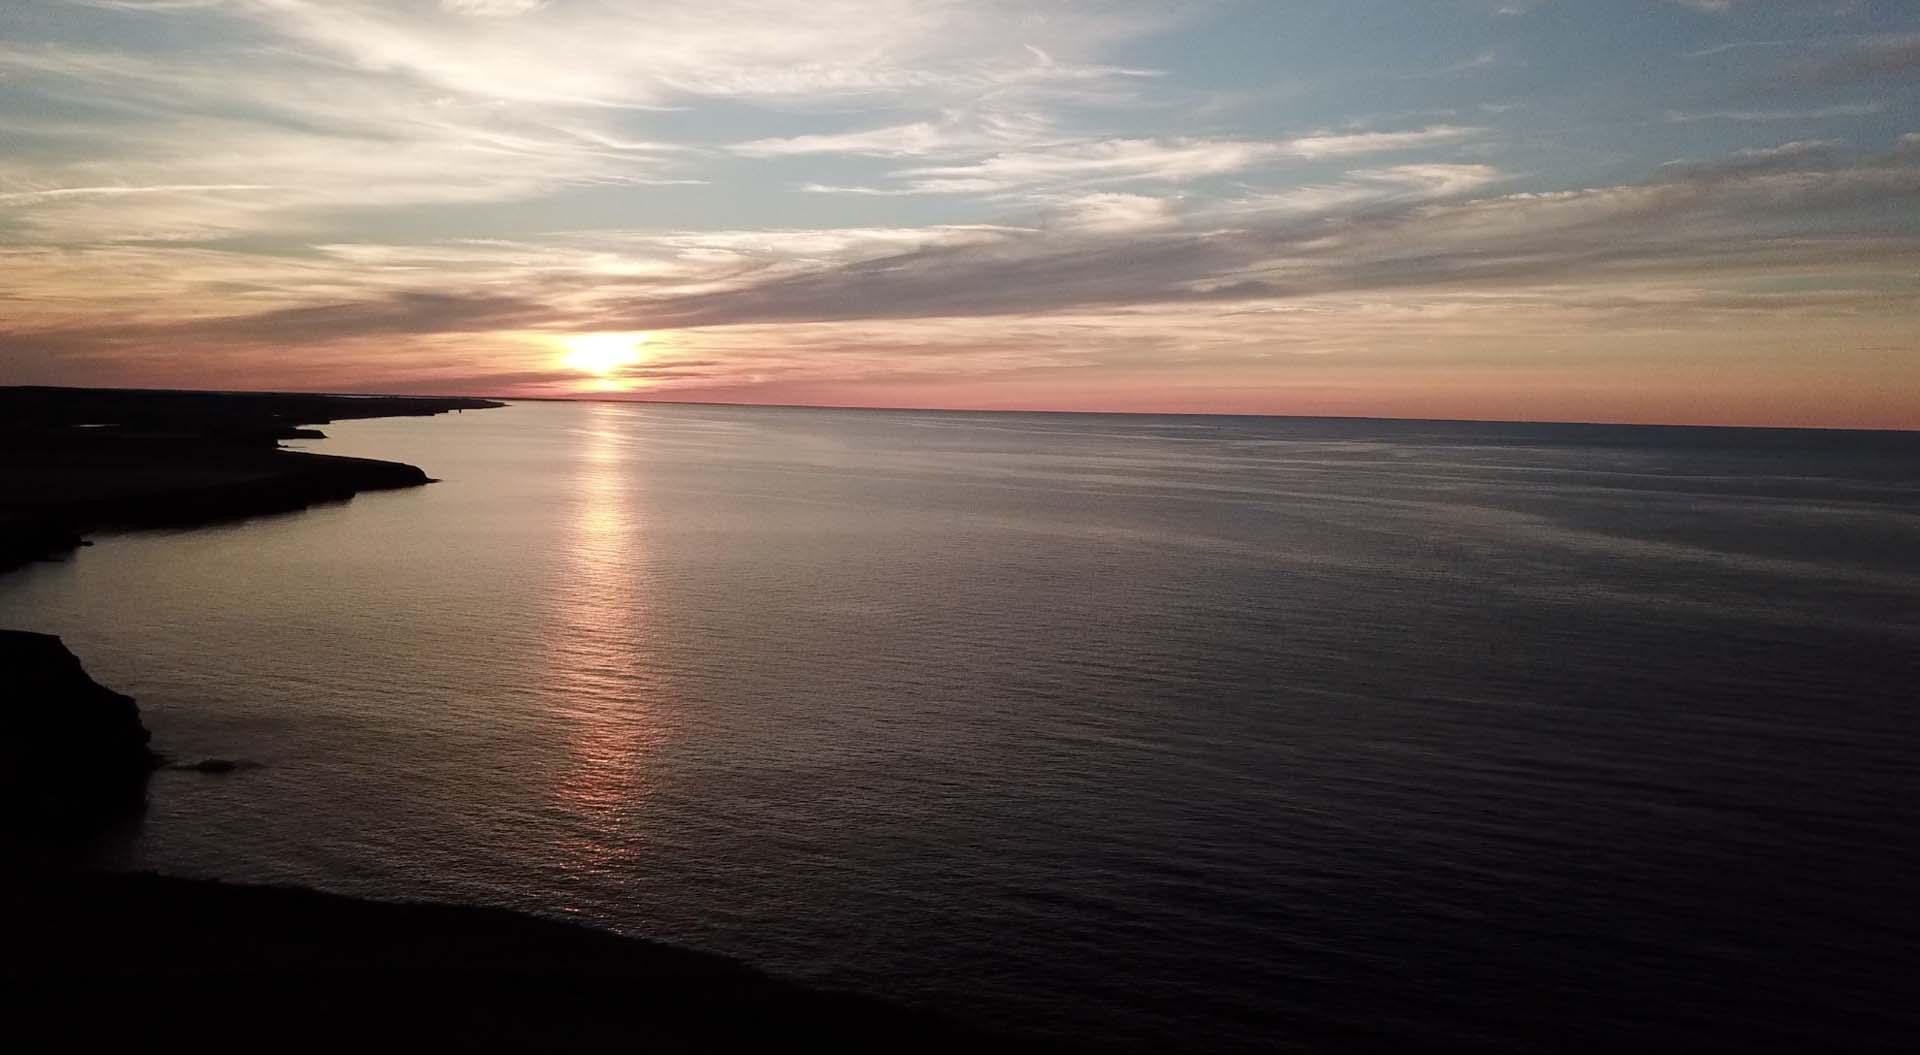 beach of Prince Edward Island at sunset